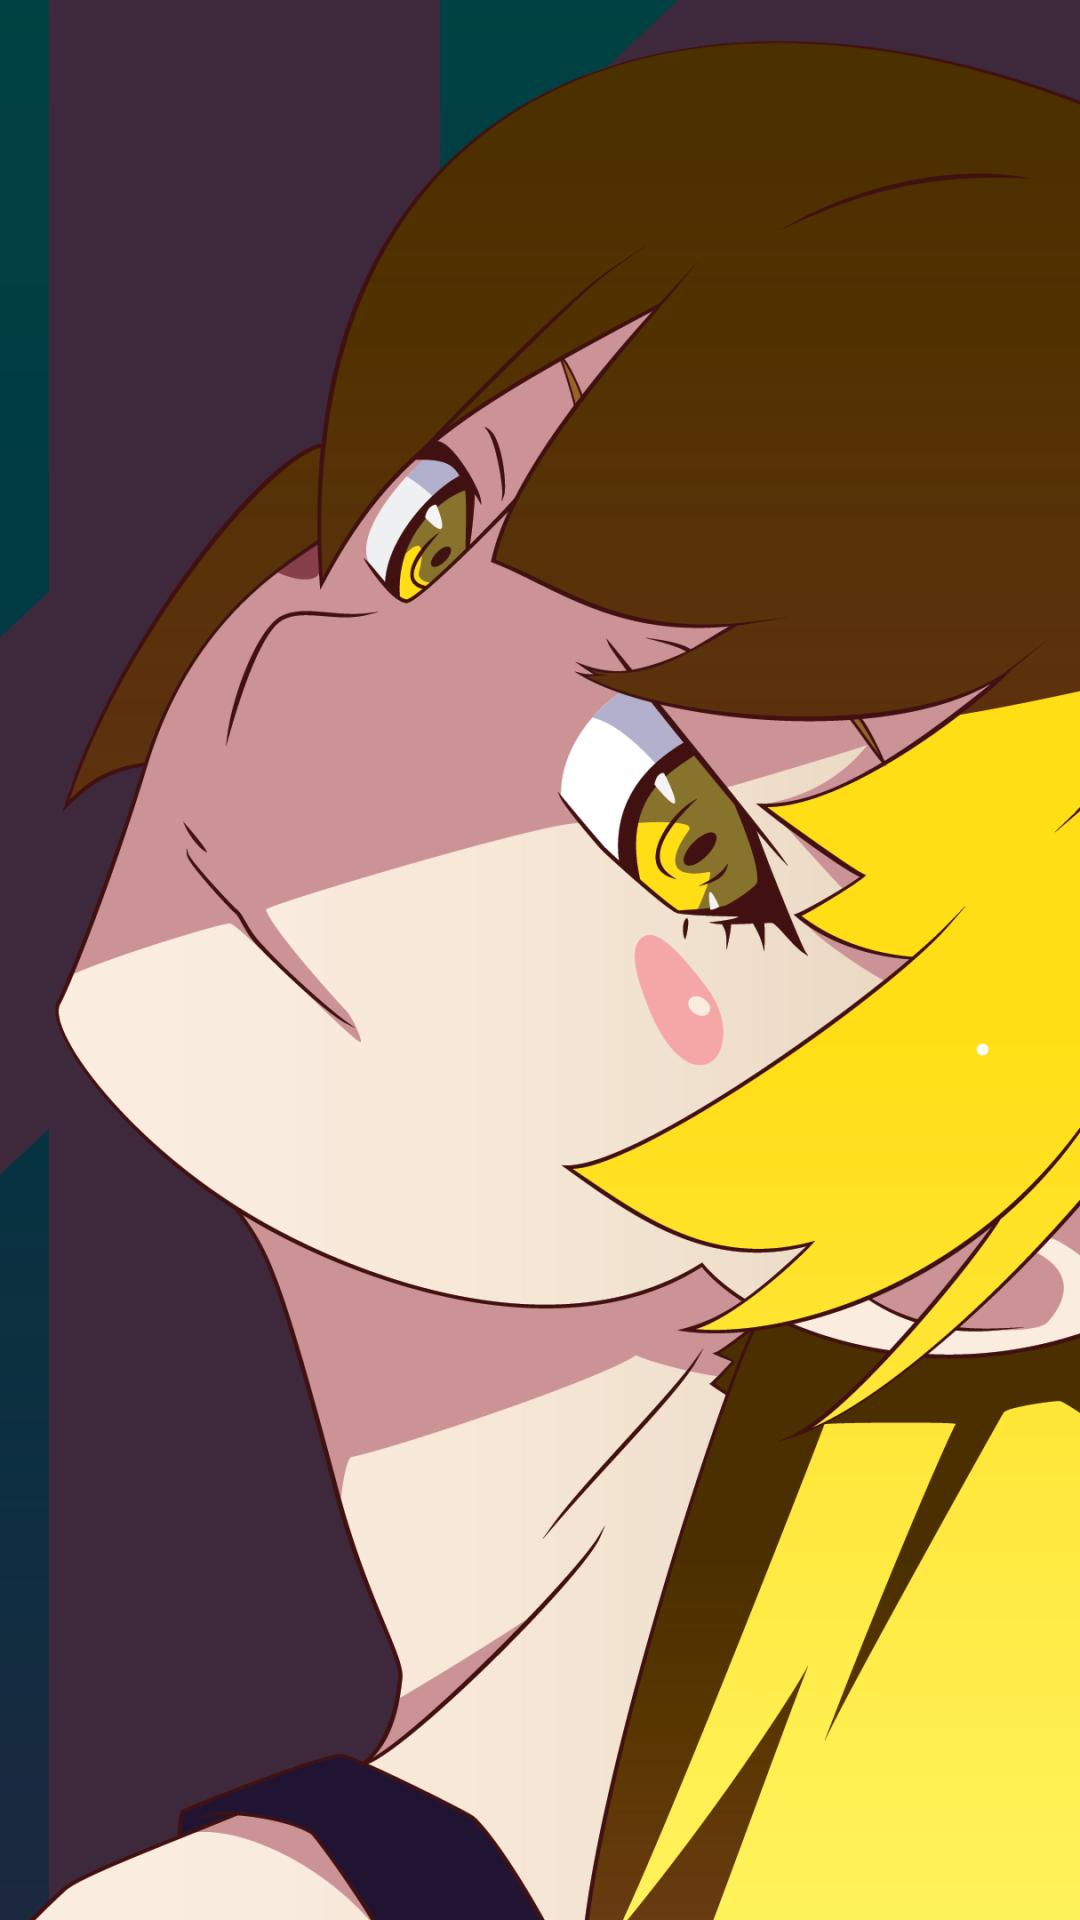 Iphone 5 Anime Monogatari Series Wallpaper Id 615175 物語